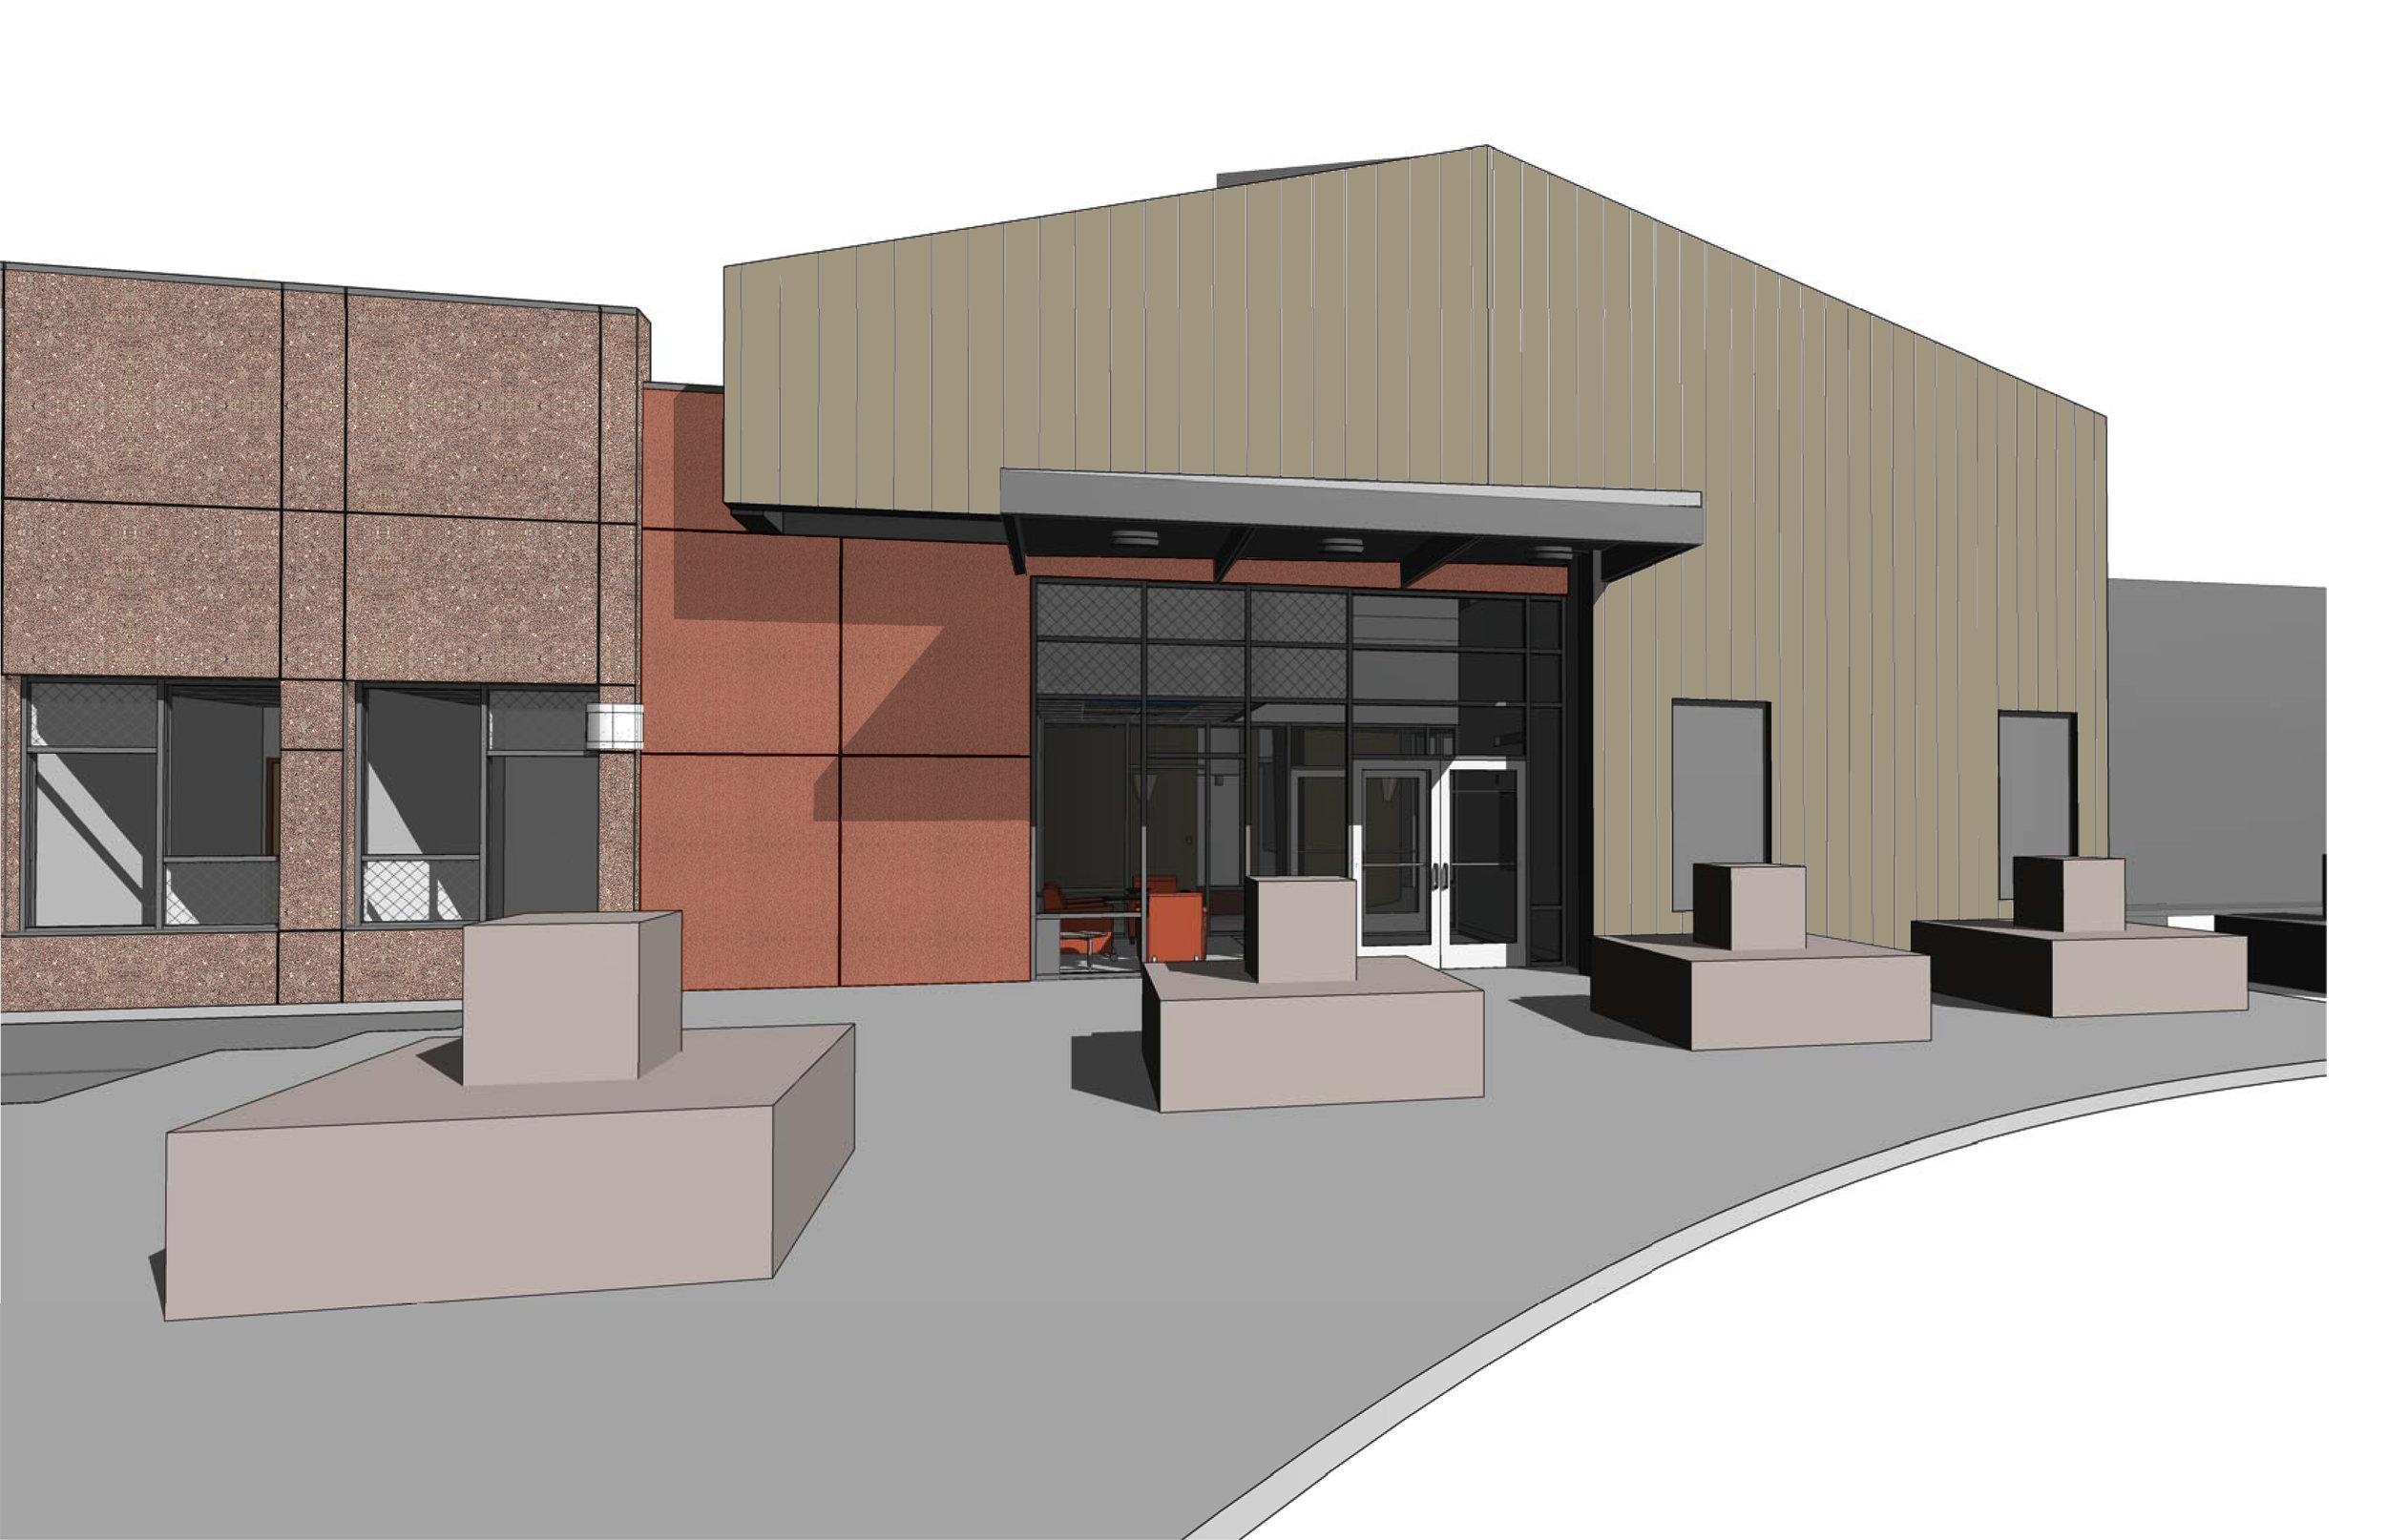 Sandia National Laboratories - Building 905